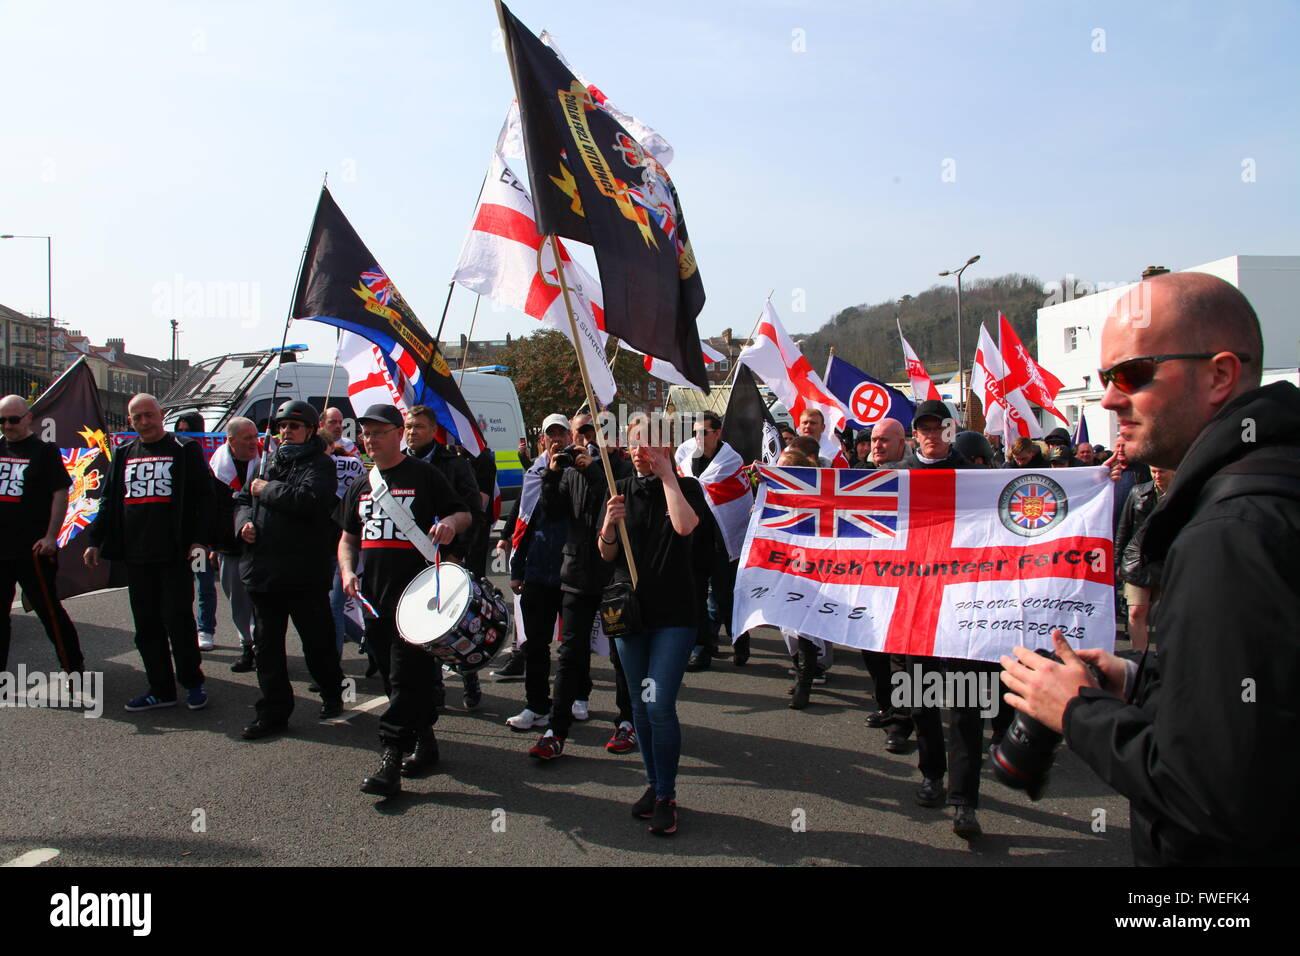 South East Alliance far right Unity demonstration. Dover, Kent, UK. - Stock Image